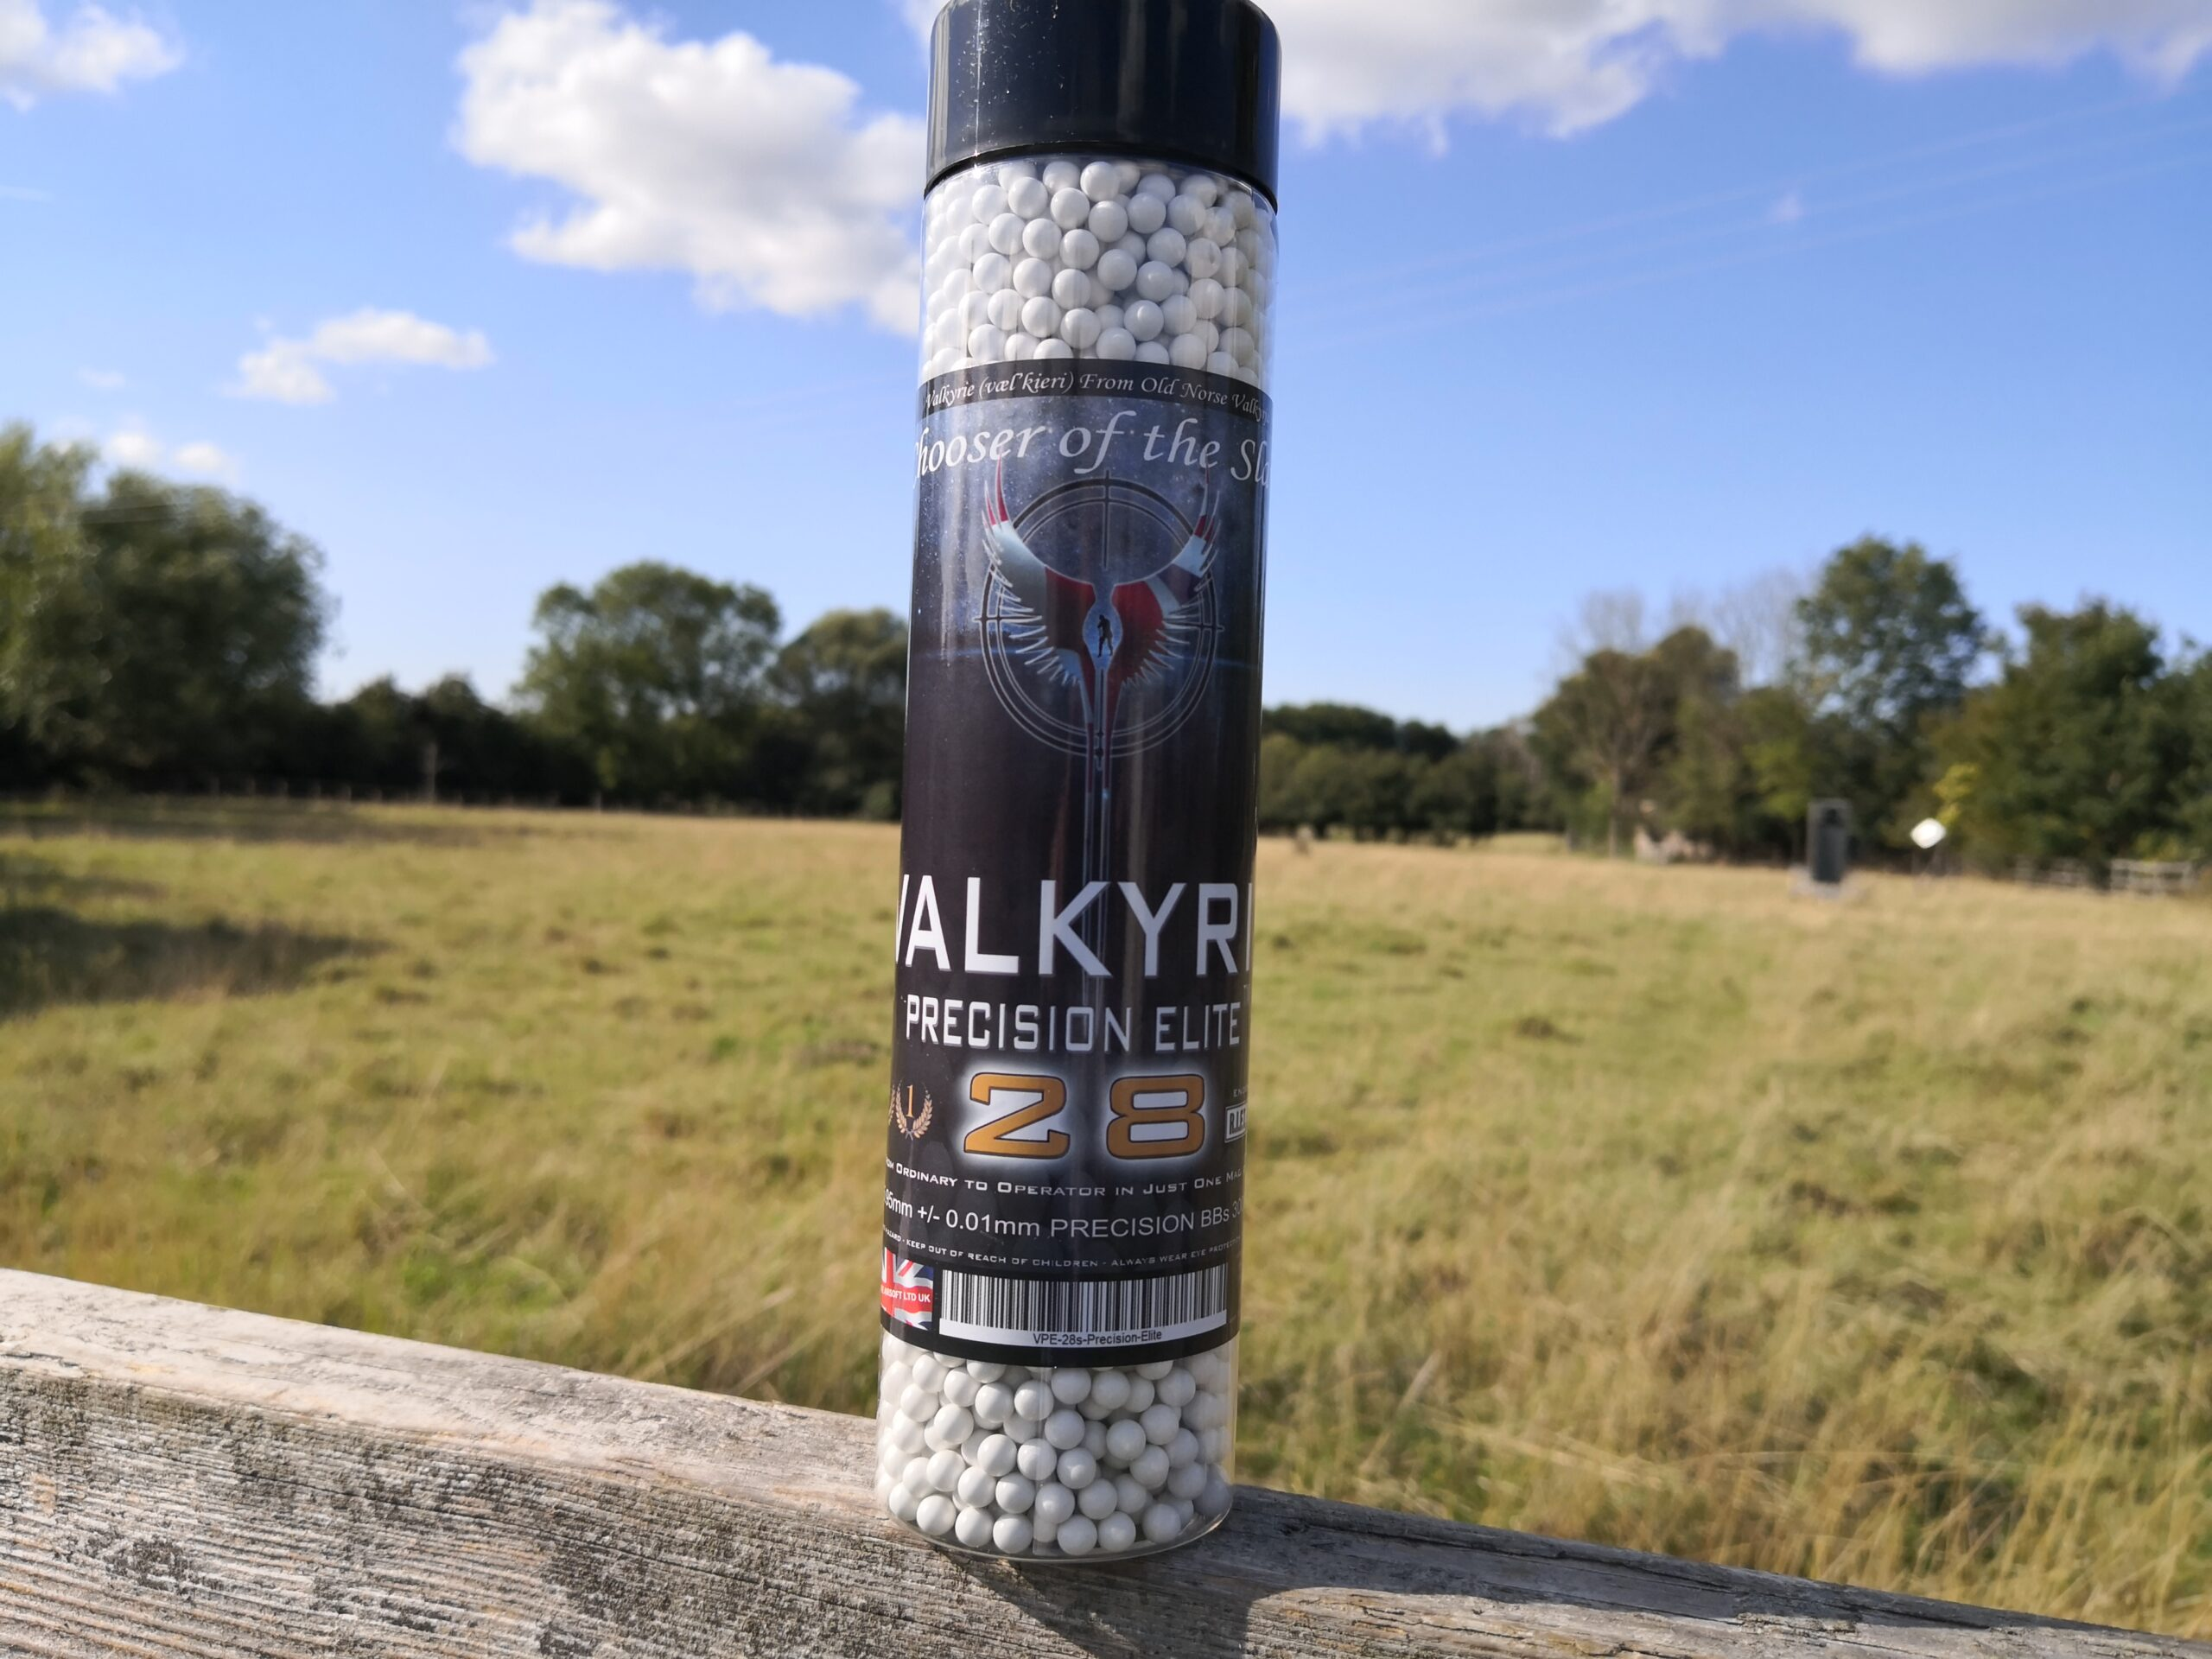 The 28 - Valkyrie Precision Elite Premium BBs - Consistent - Precise - Accurate